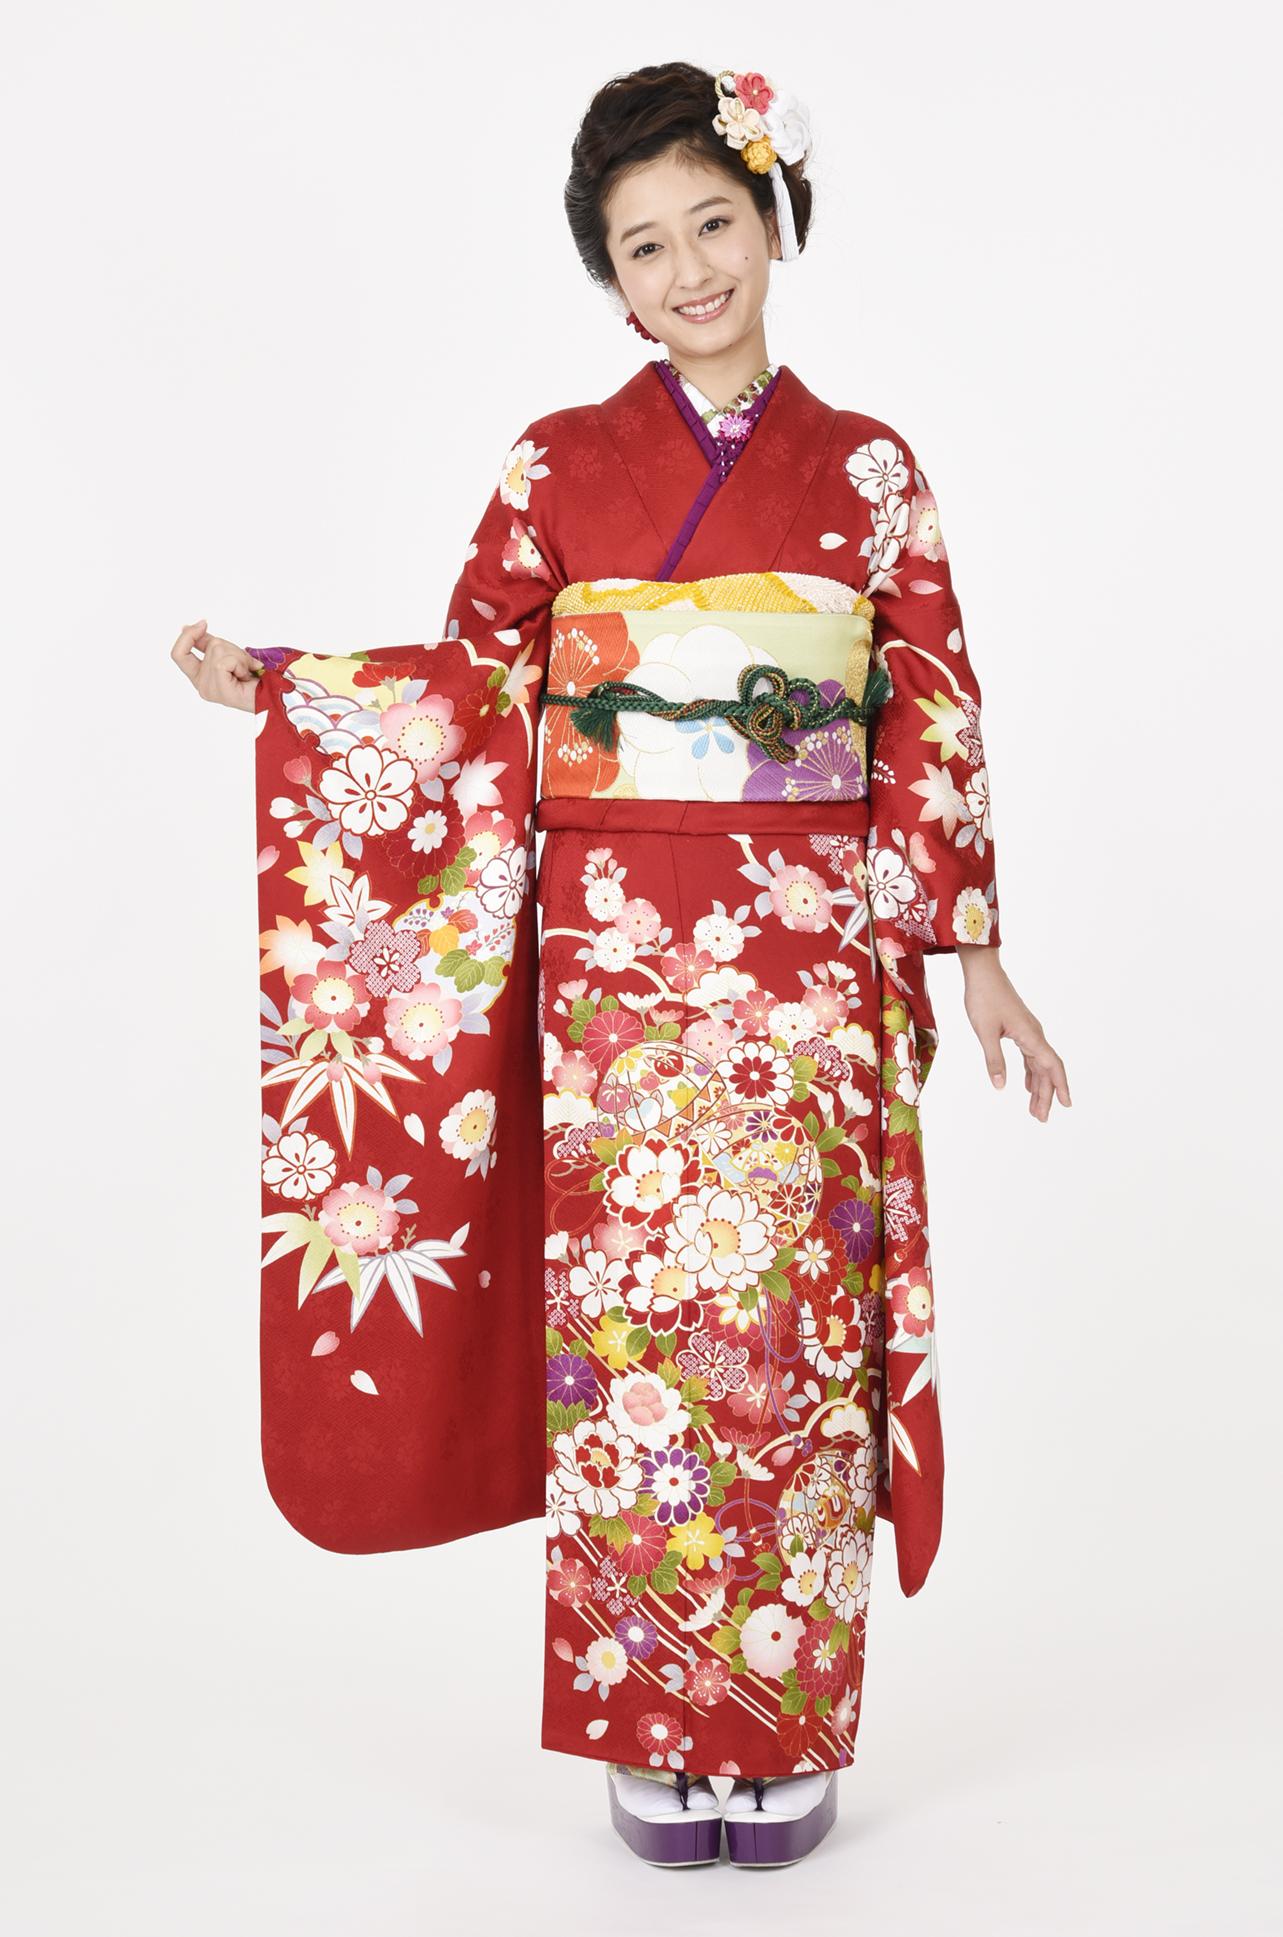 【MKK-2905】赤地に愛らしい桜と毬柄振袖